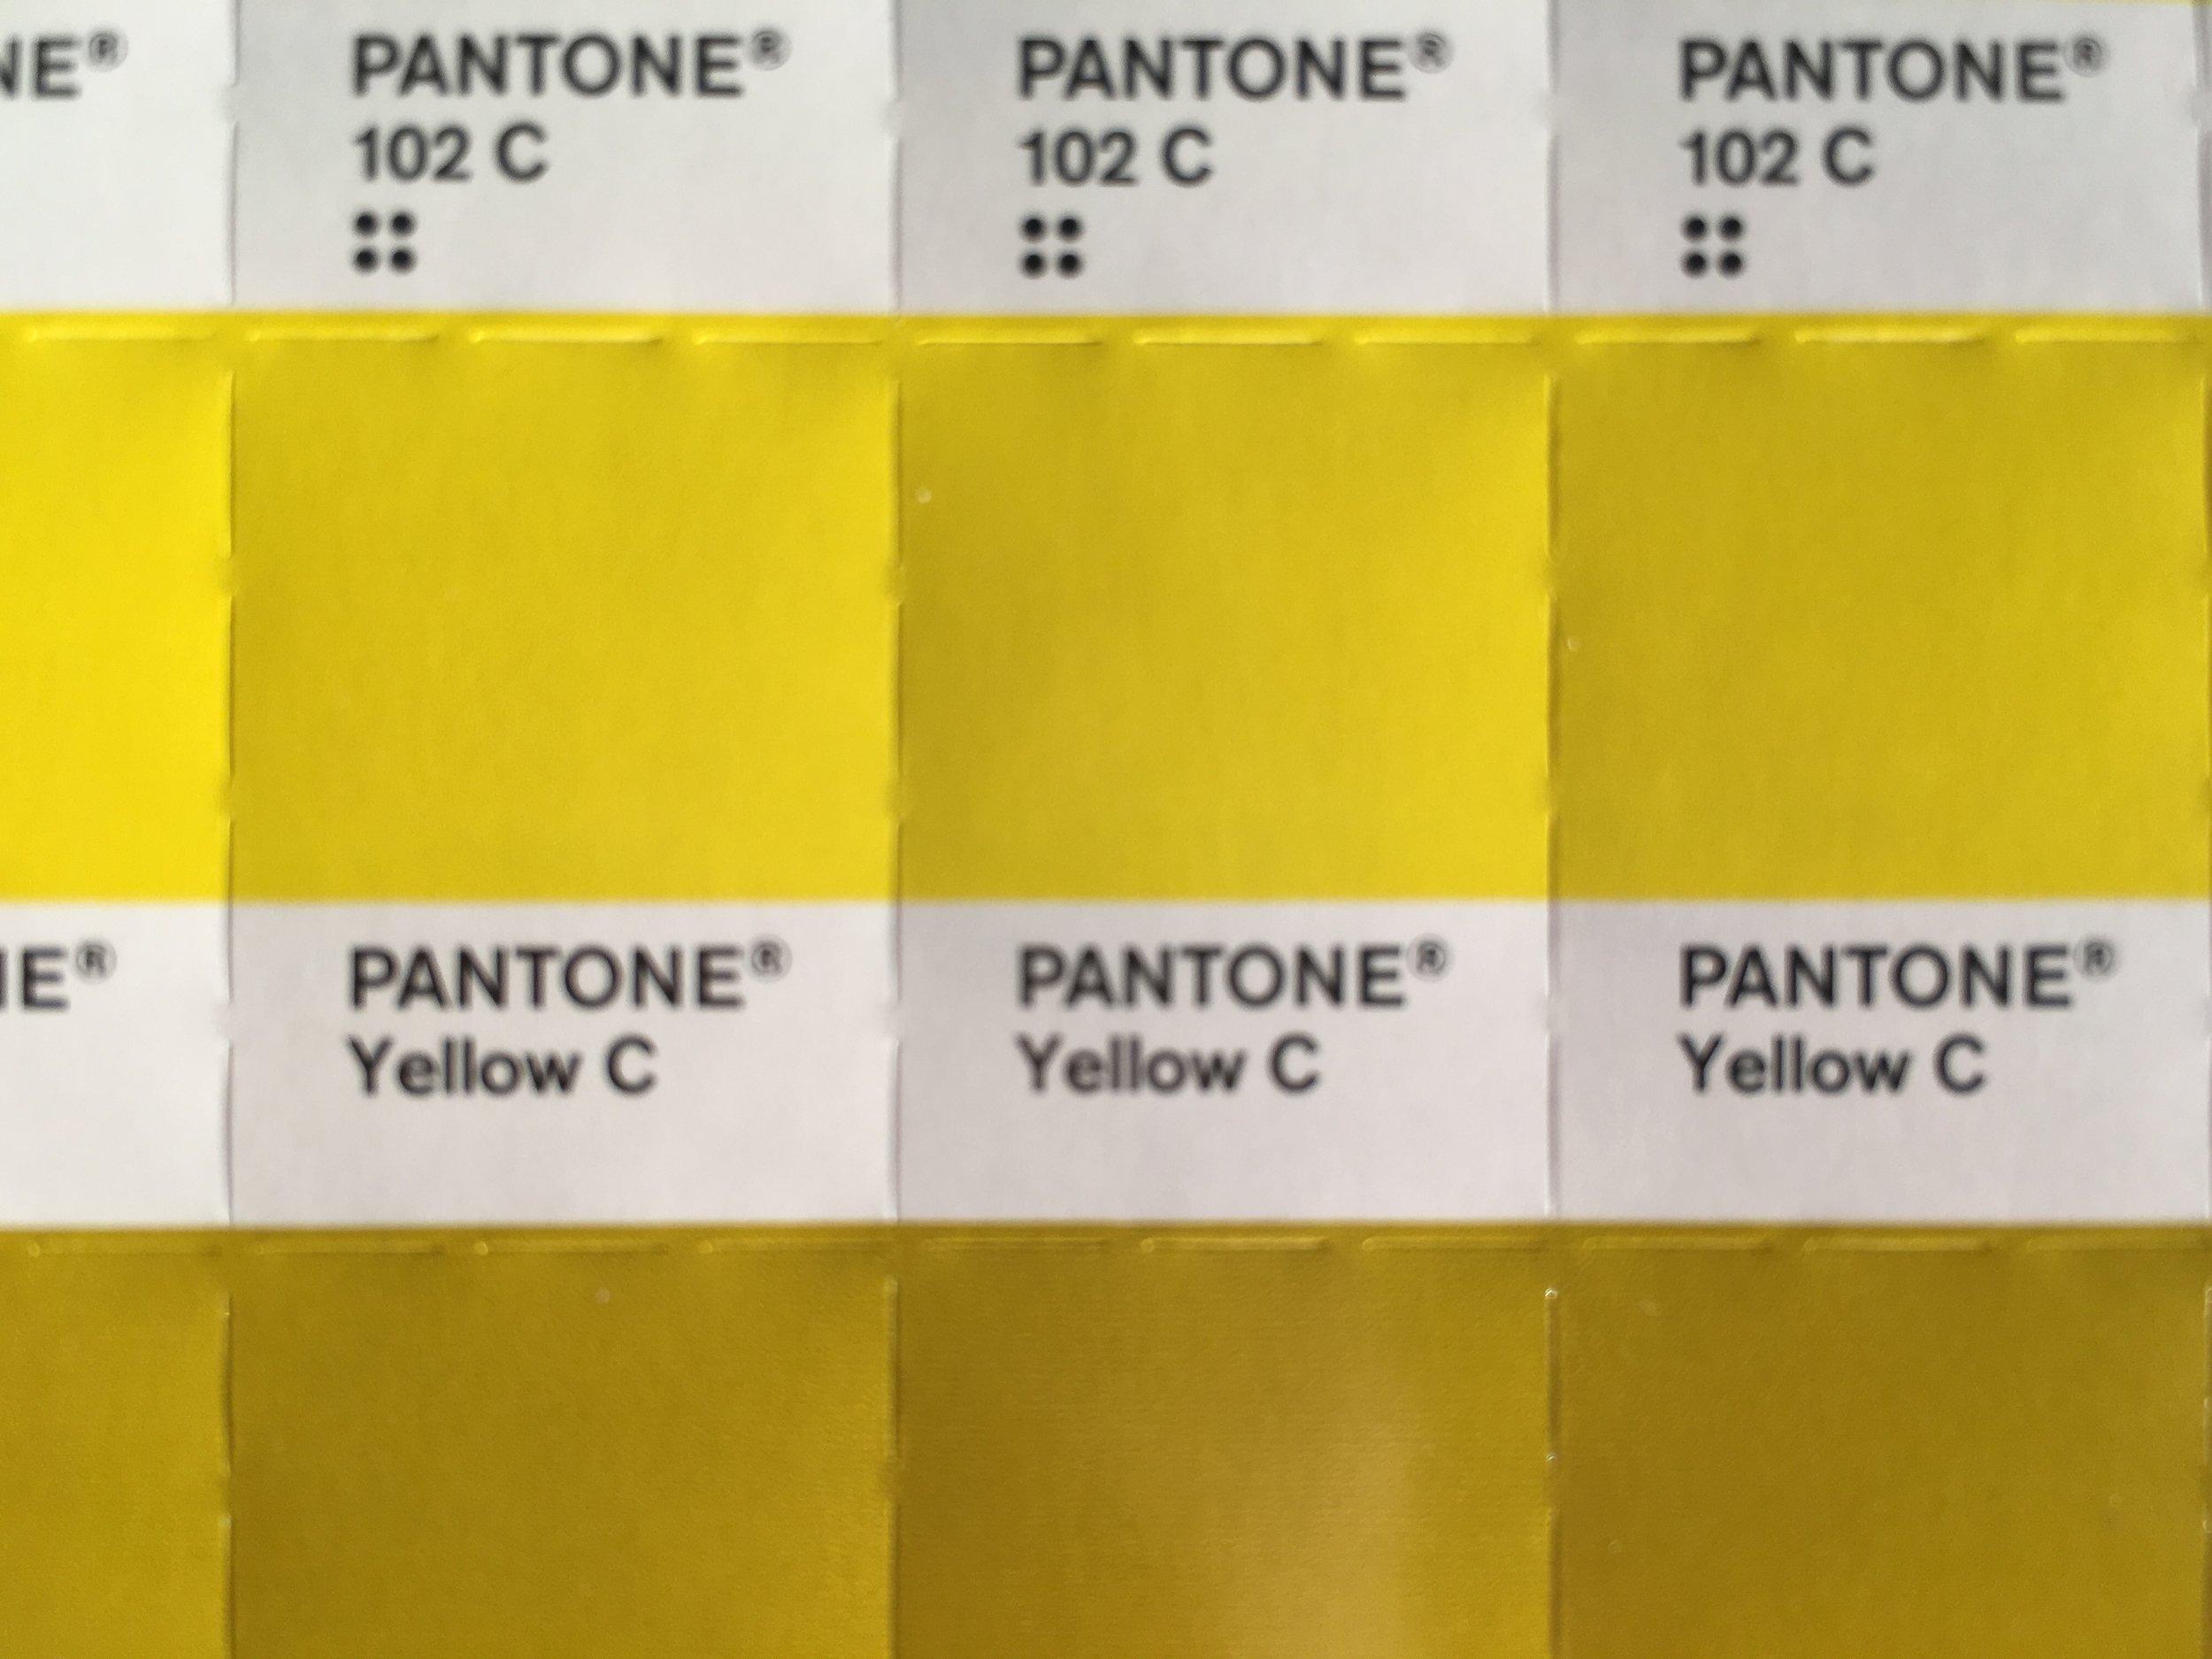 pantone yellow c.JPG